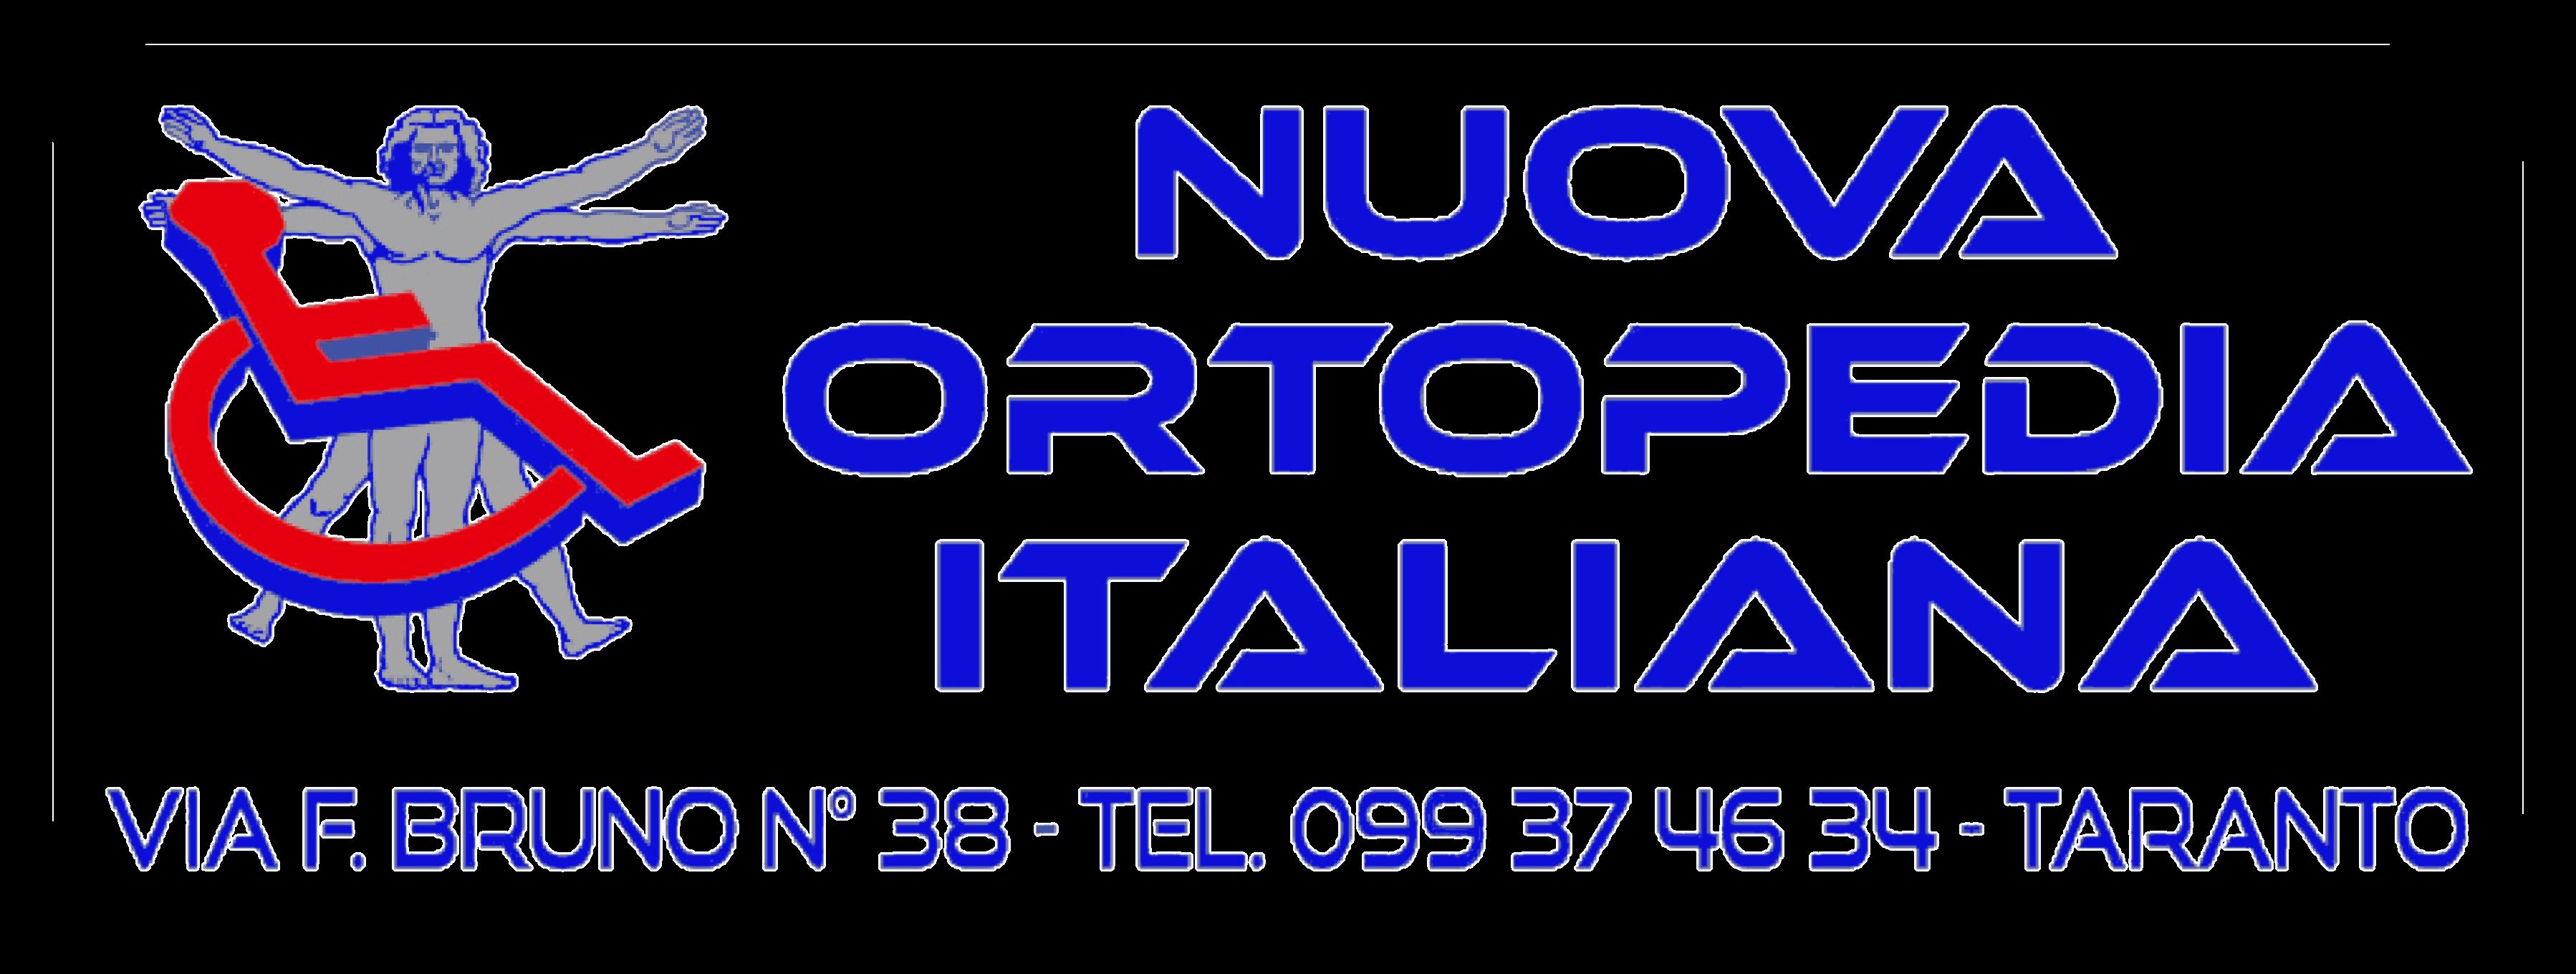 nuova ortopedia italiana